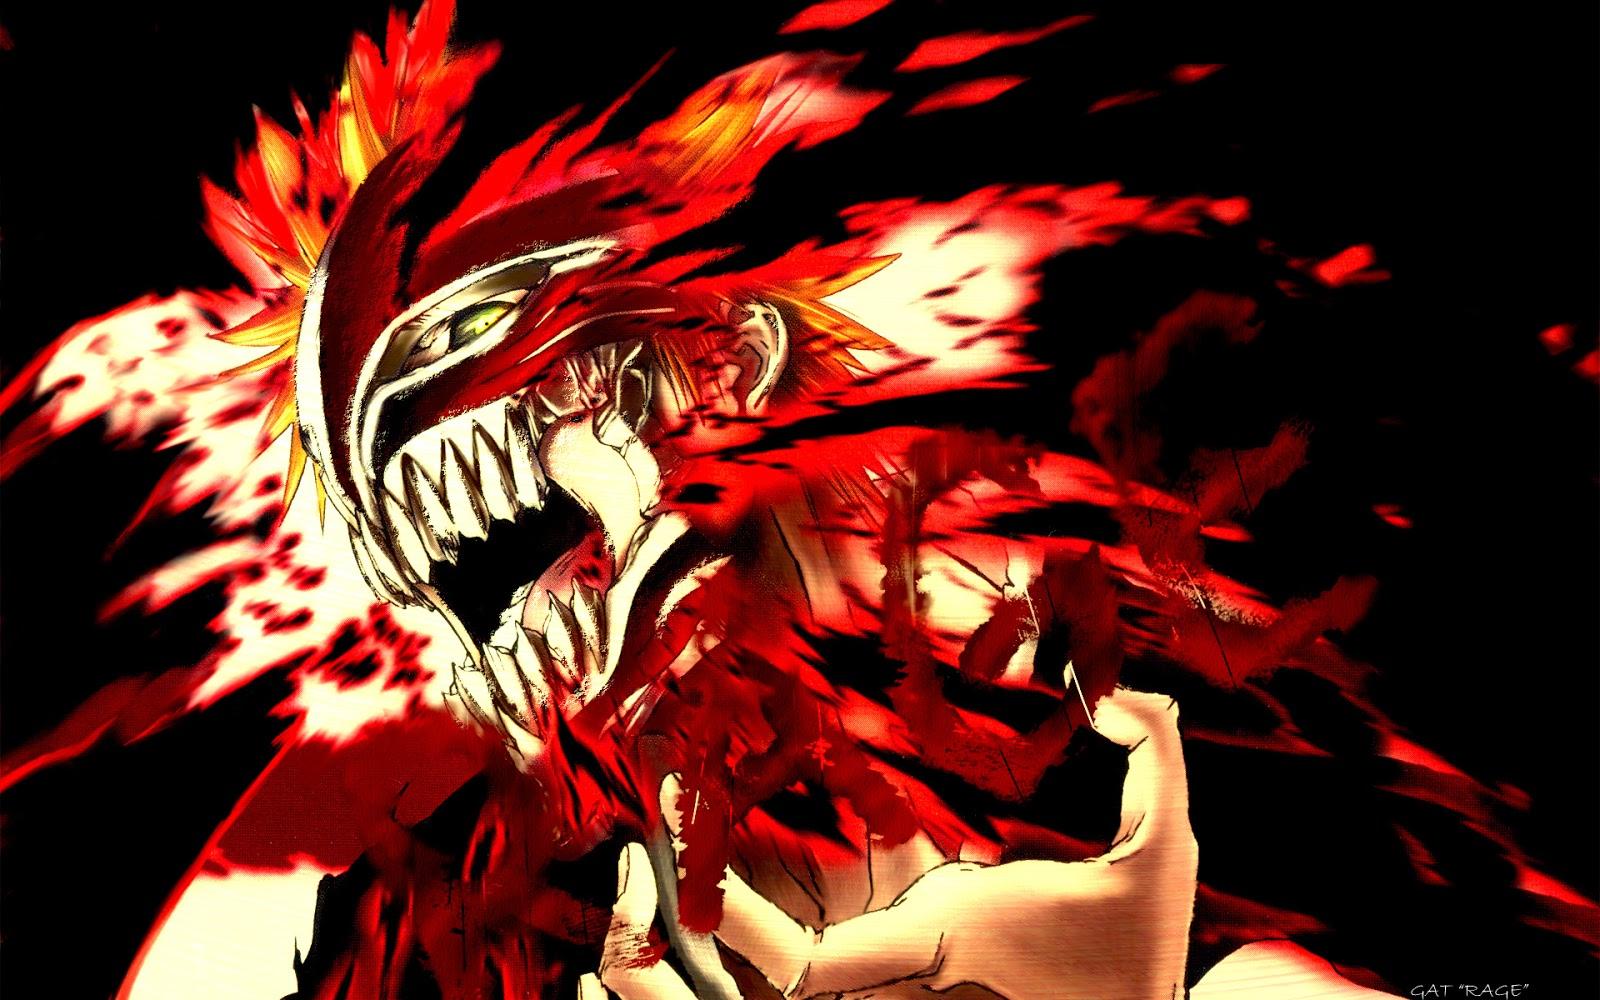 Kurosaki Ichigo Vizard 7 Wallpapers Your daily Anime 1600x1000